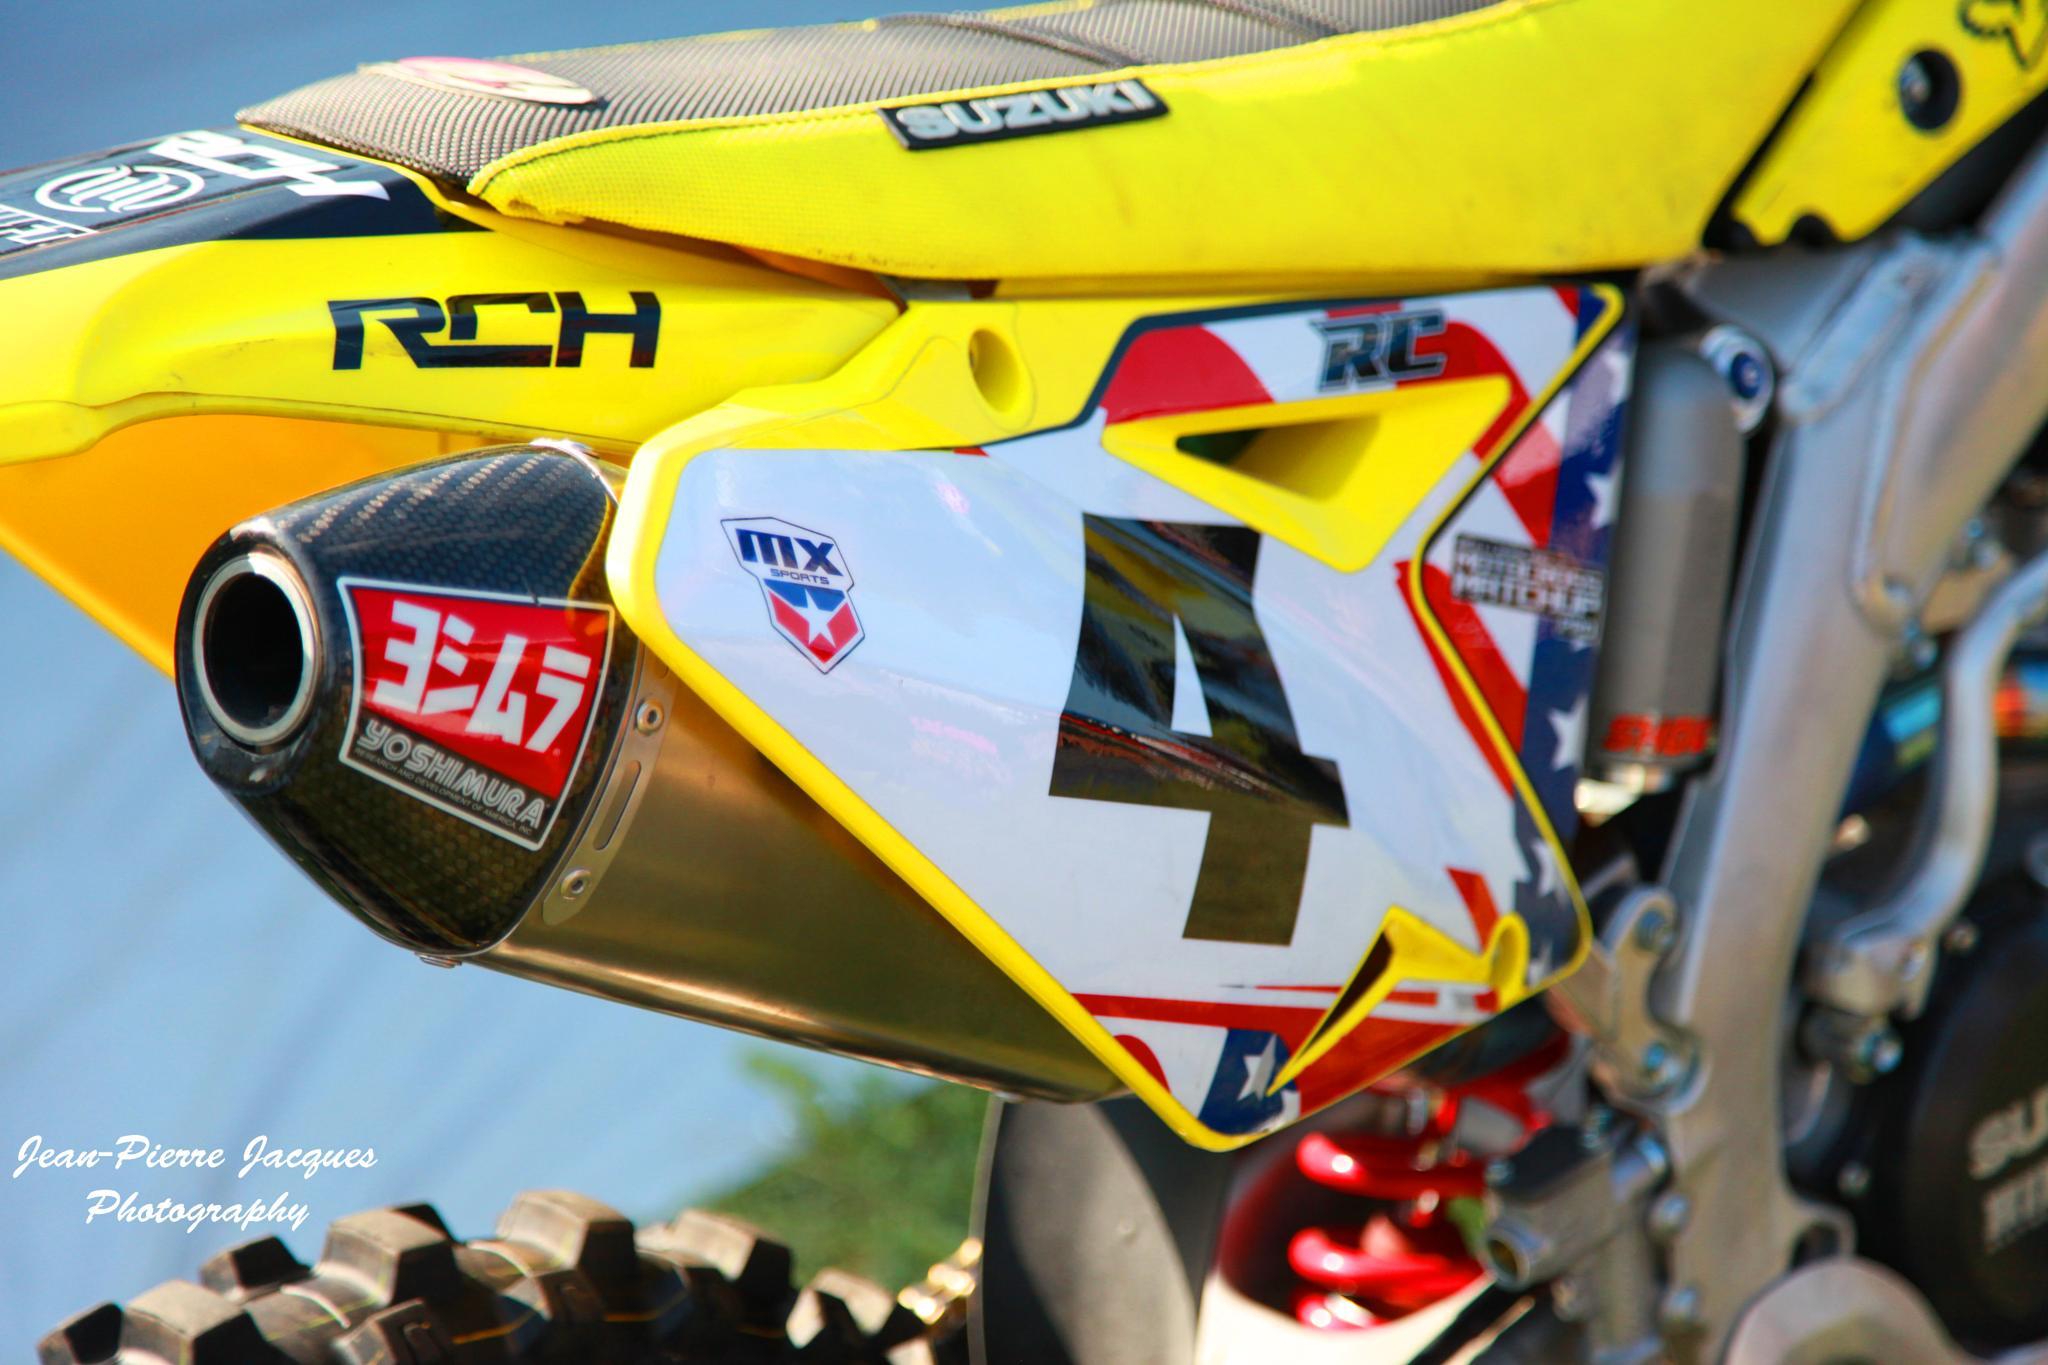 2014 Unadilla, NY. AMA Pro Motocross Championship. by Jean-Pierre Jacques